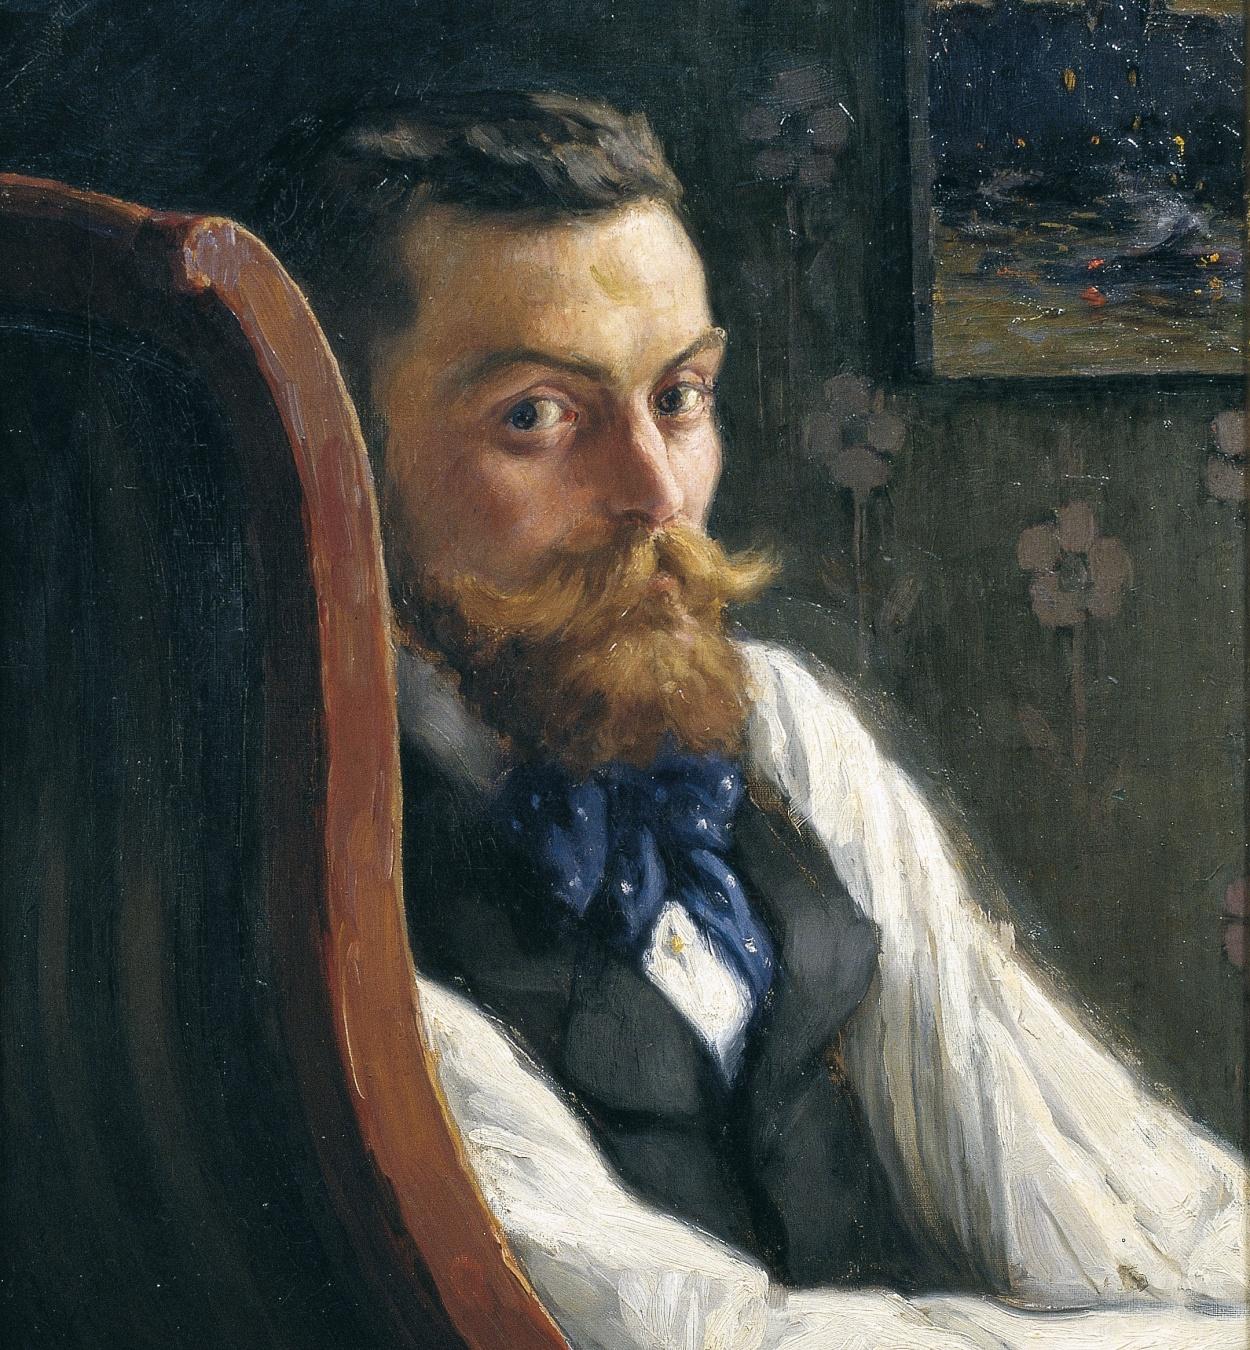 Marià Pidelaserra - Portrait of the Painter Pere Ysern - Paris, 1900